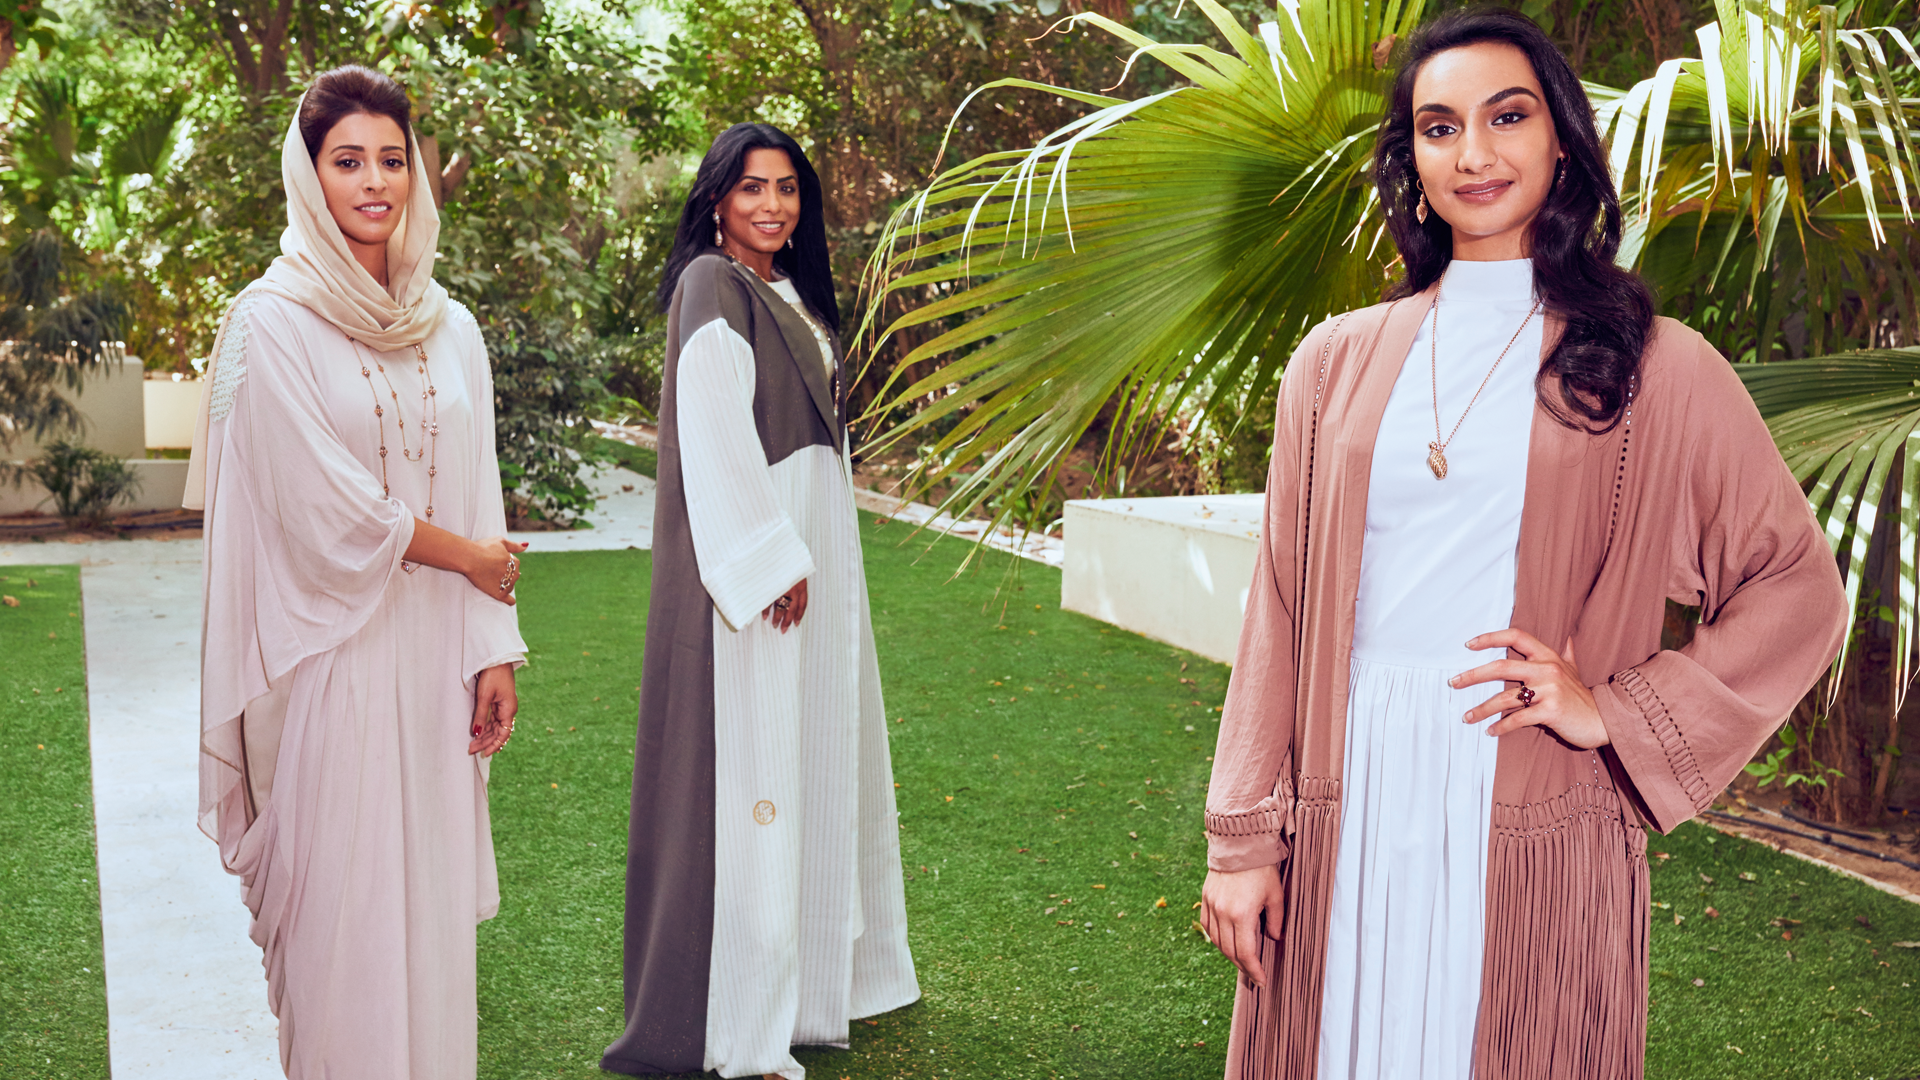 Celebrating UAE Culture | The New Gem